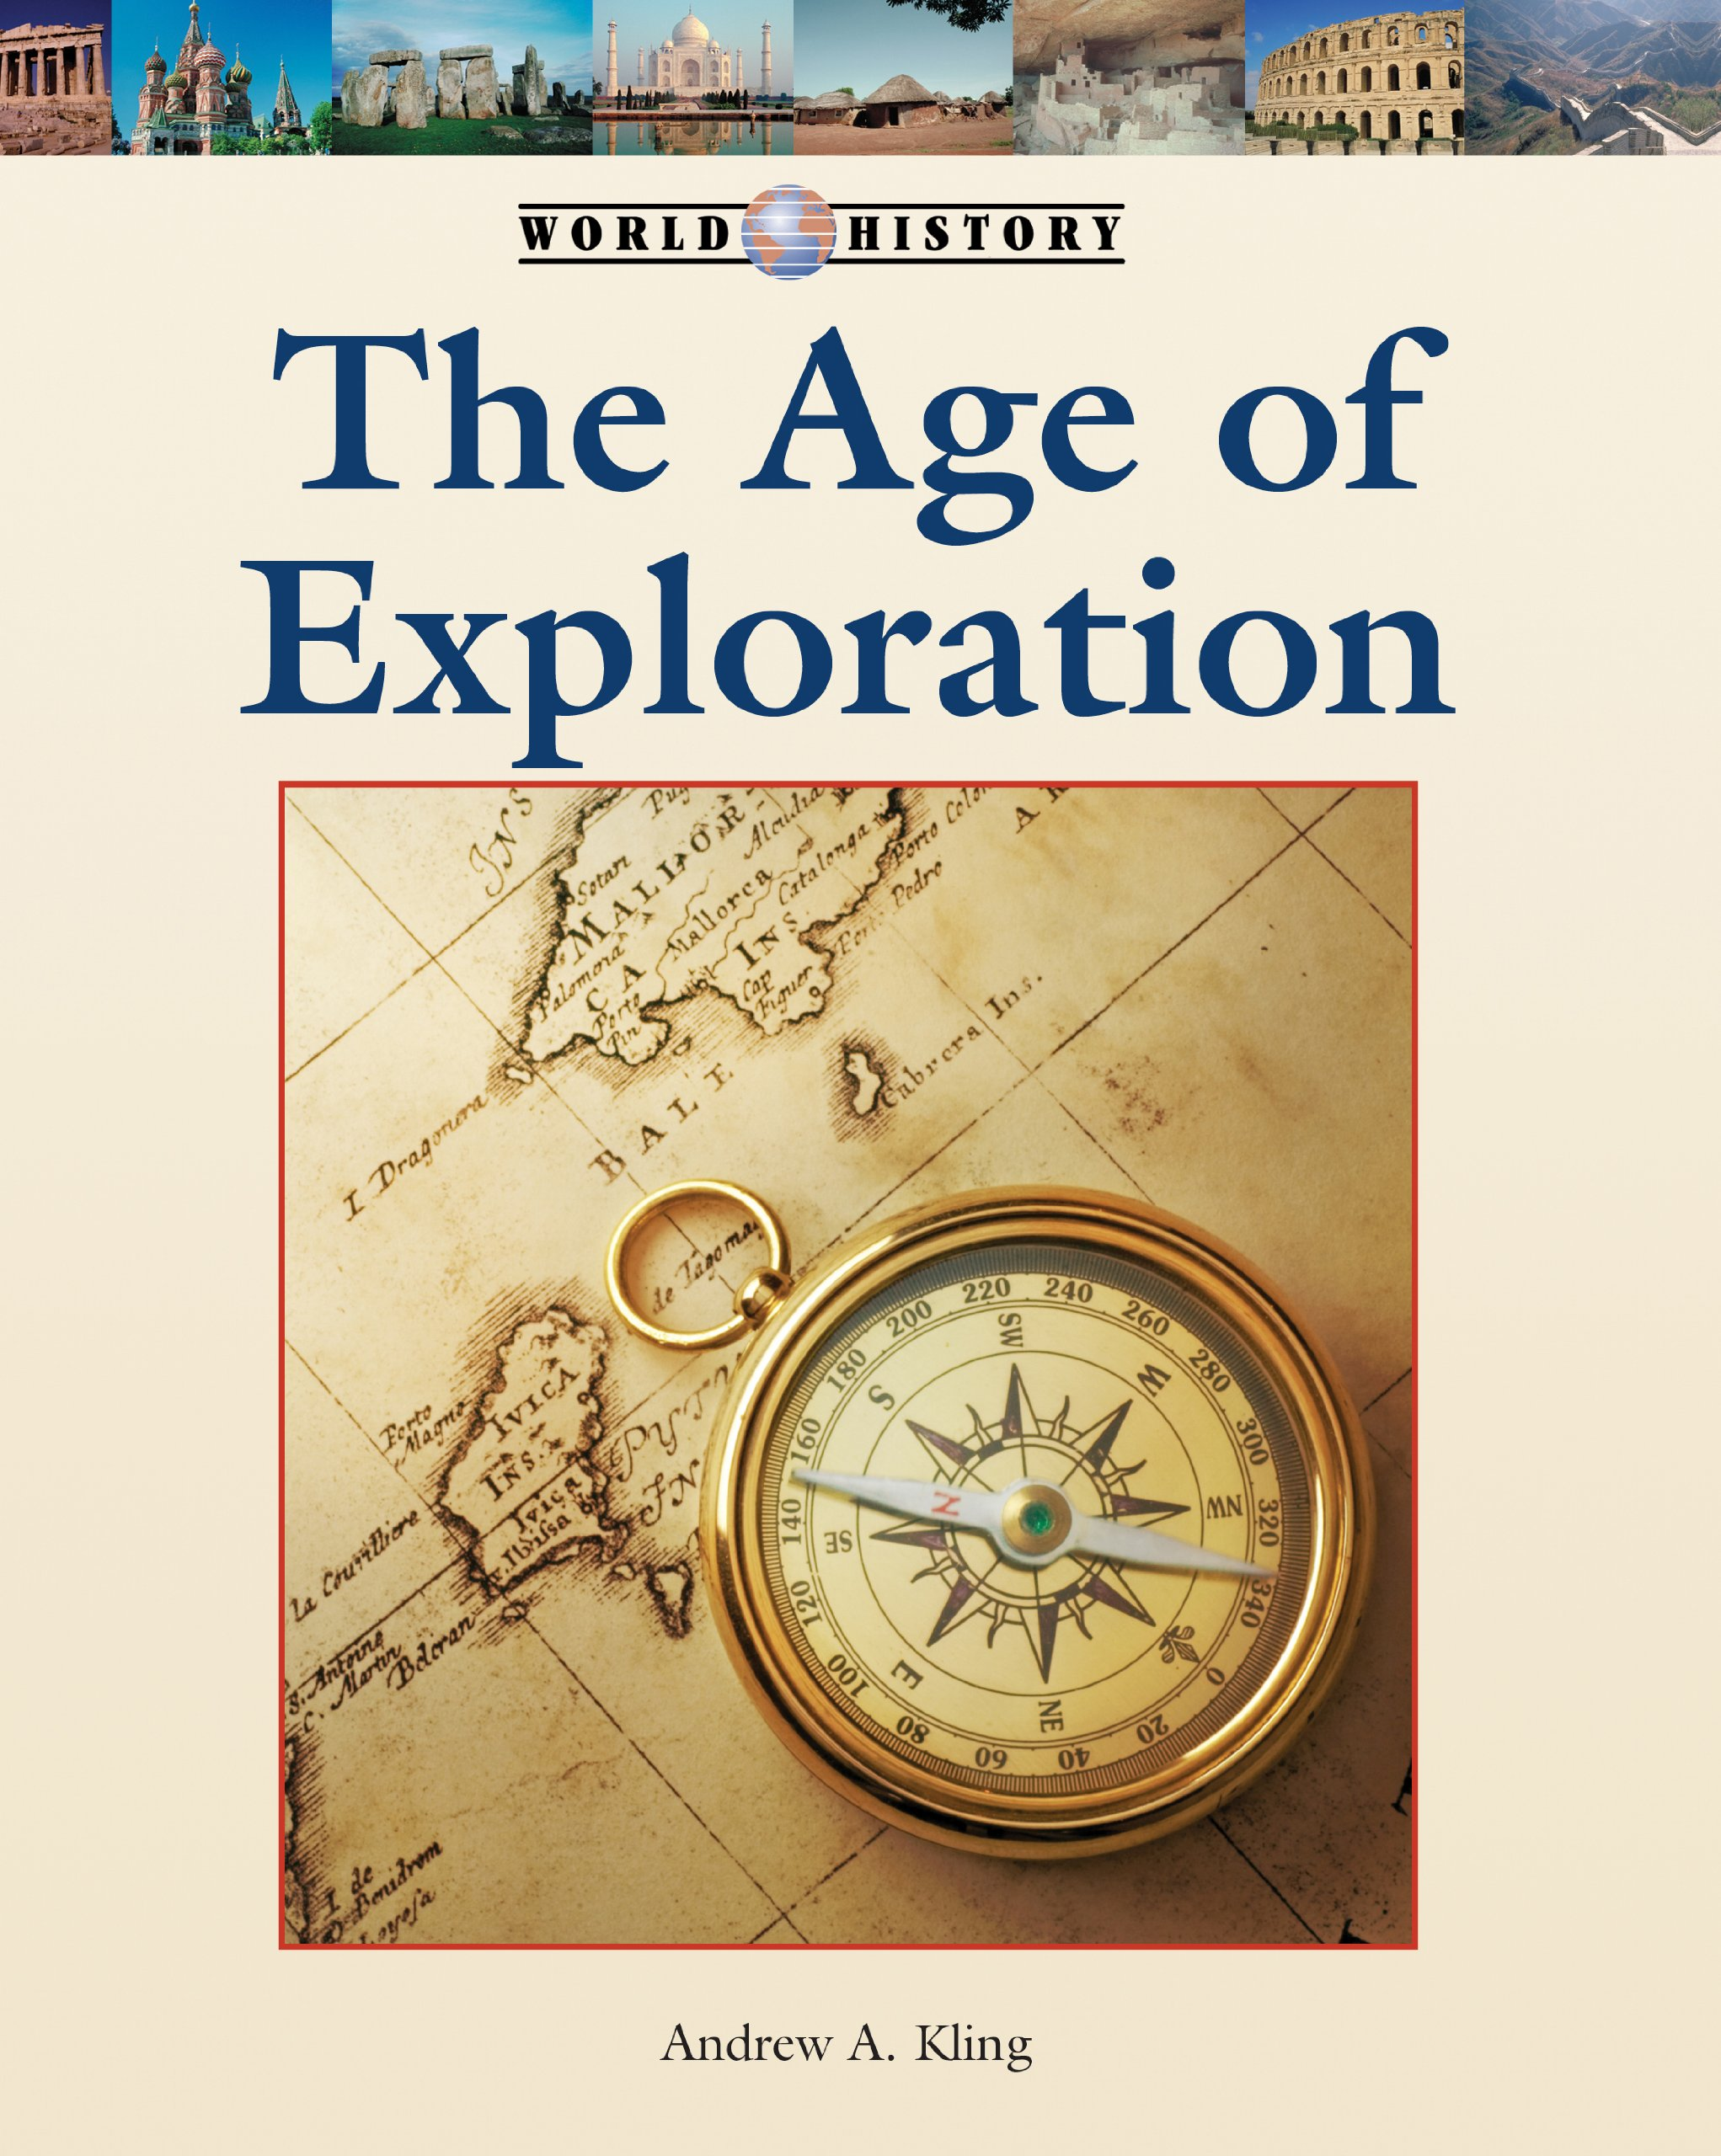 Read Online The Age of Exploration (World History Series) PDF ePub fb2 book